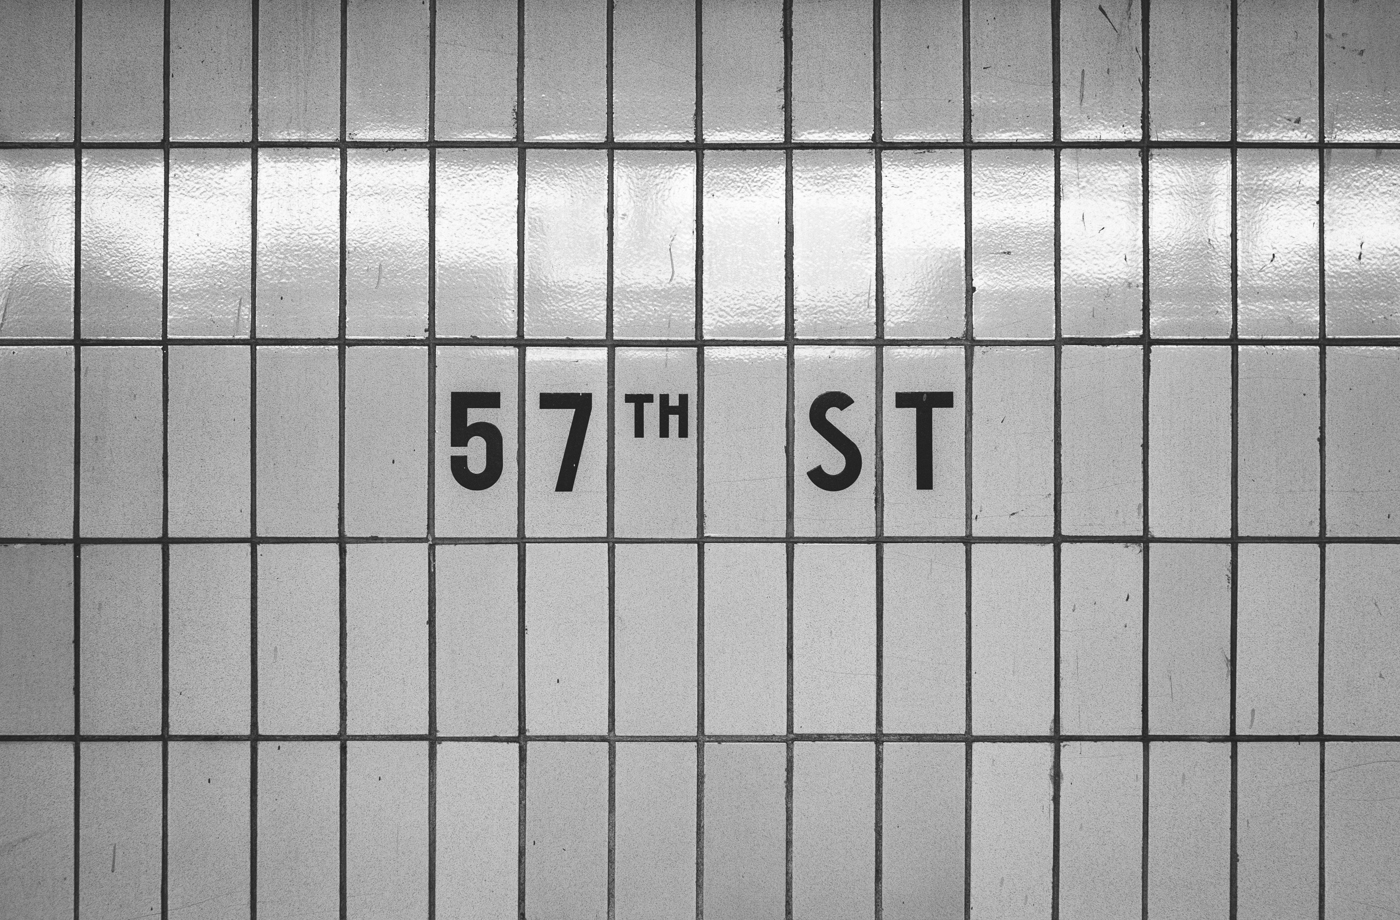 57th St